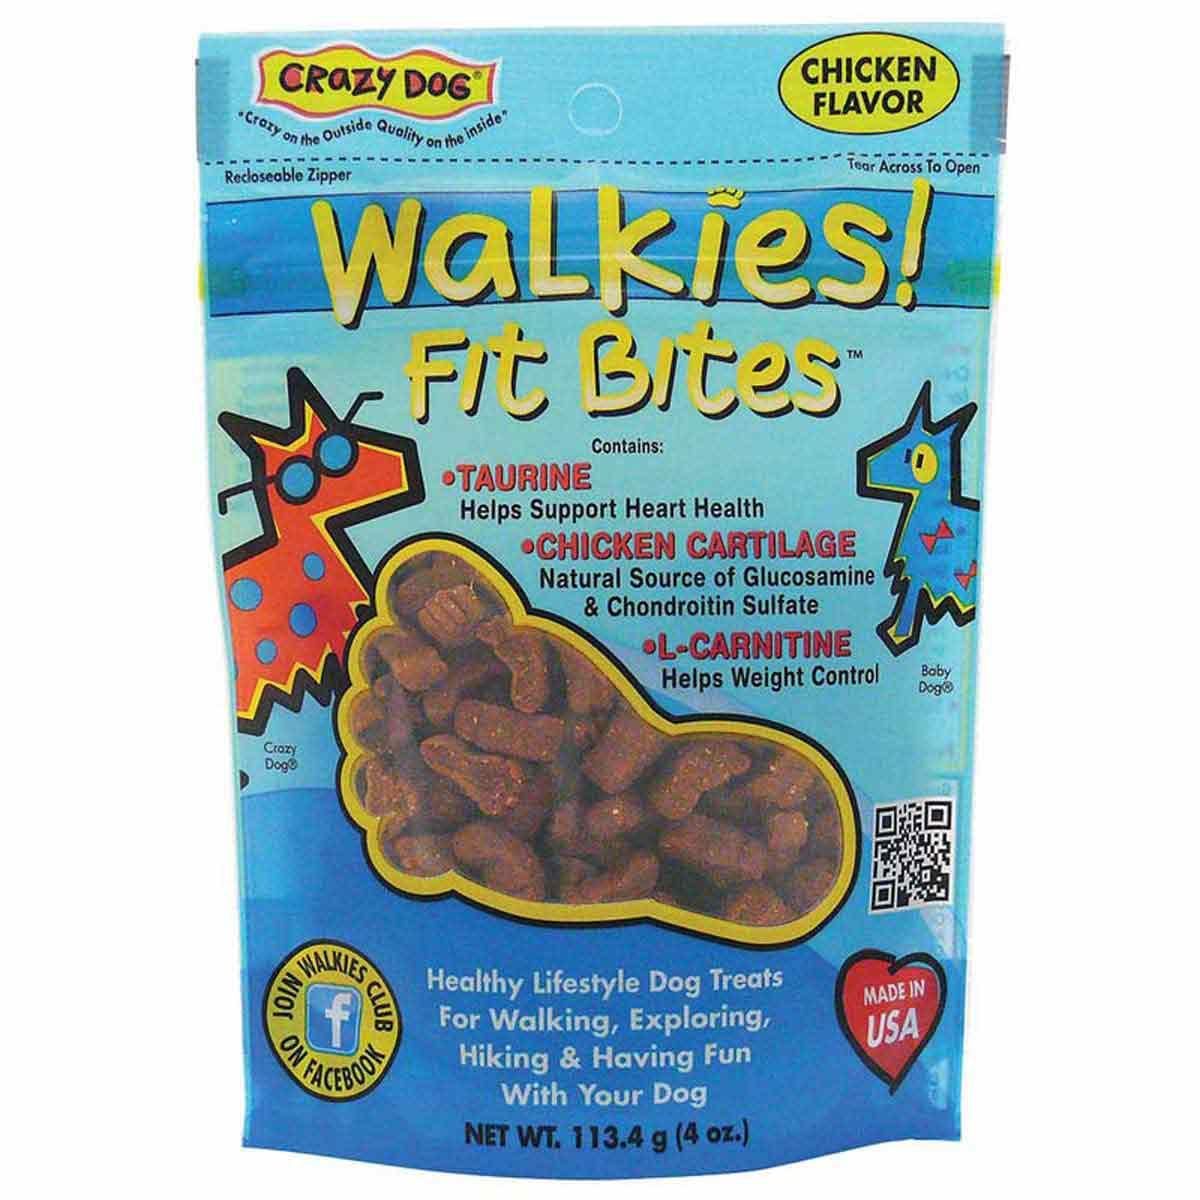 Crazy Dog Walkies! Fit Bites Chicken Treats - 4 ounces